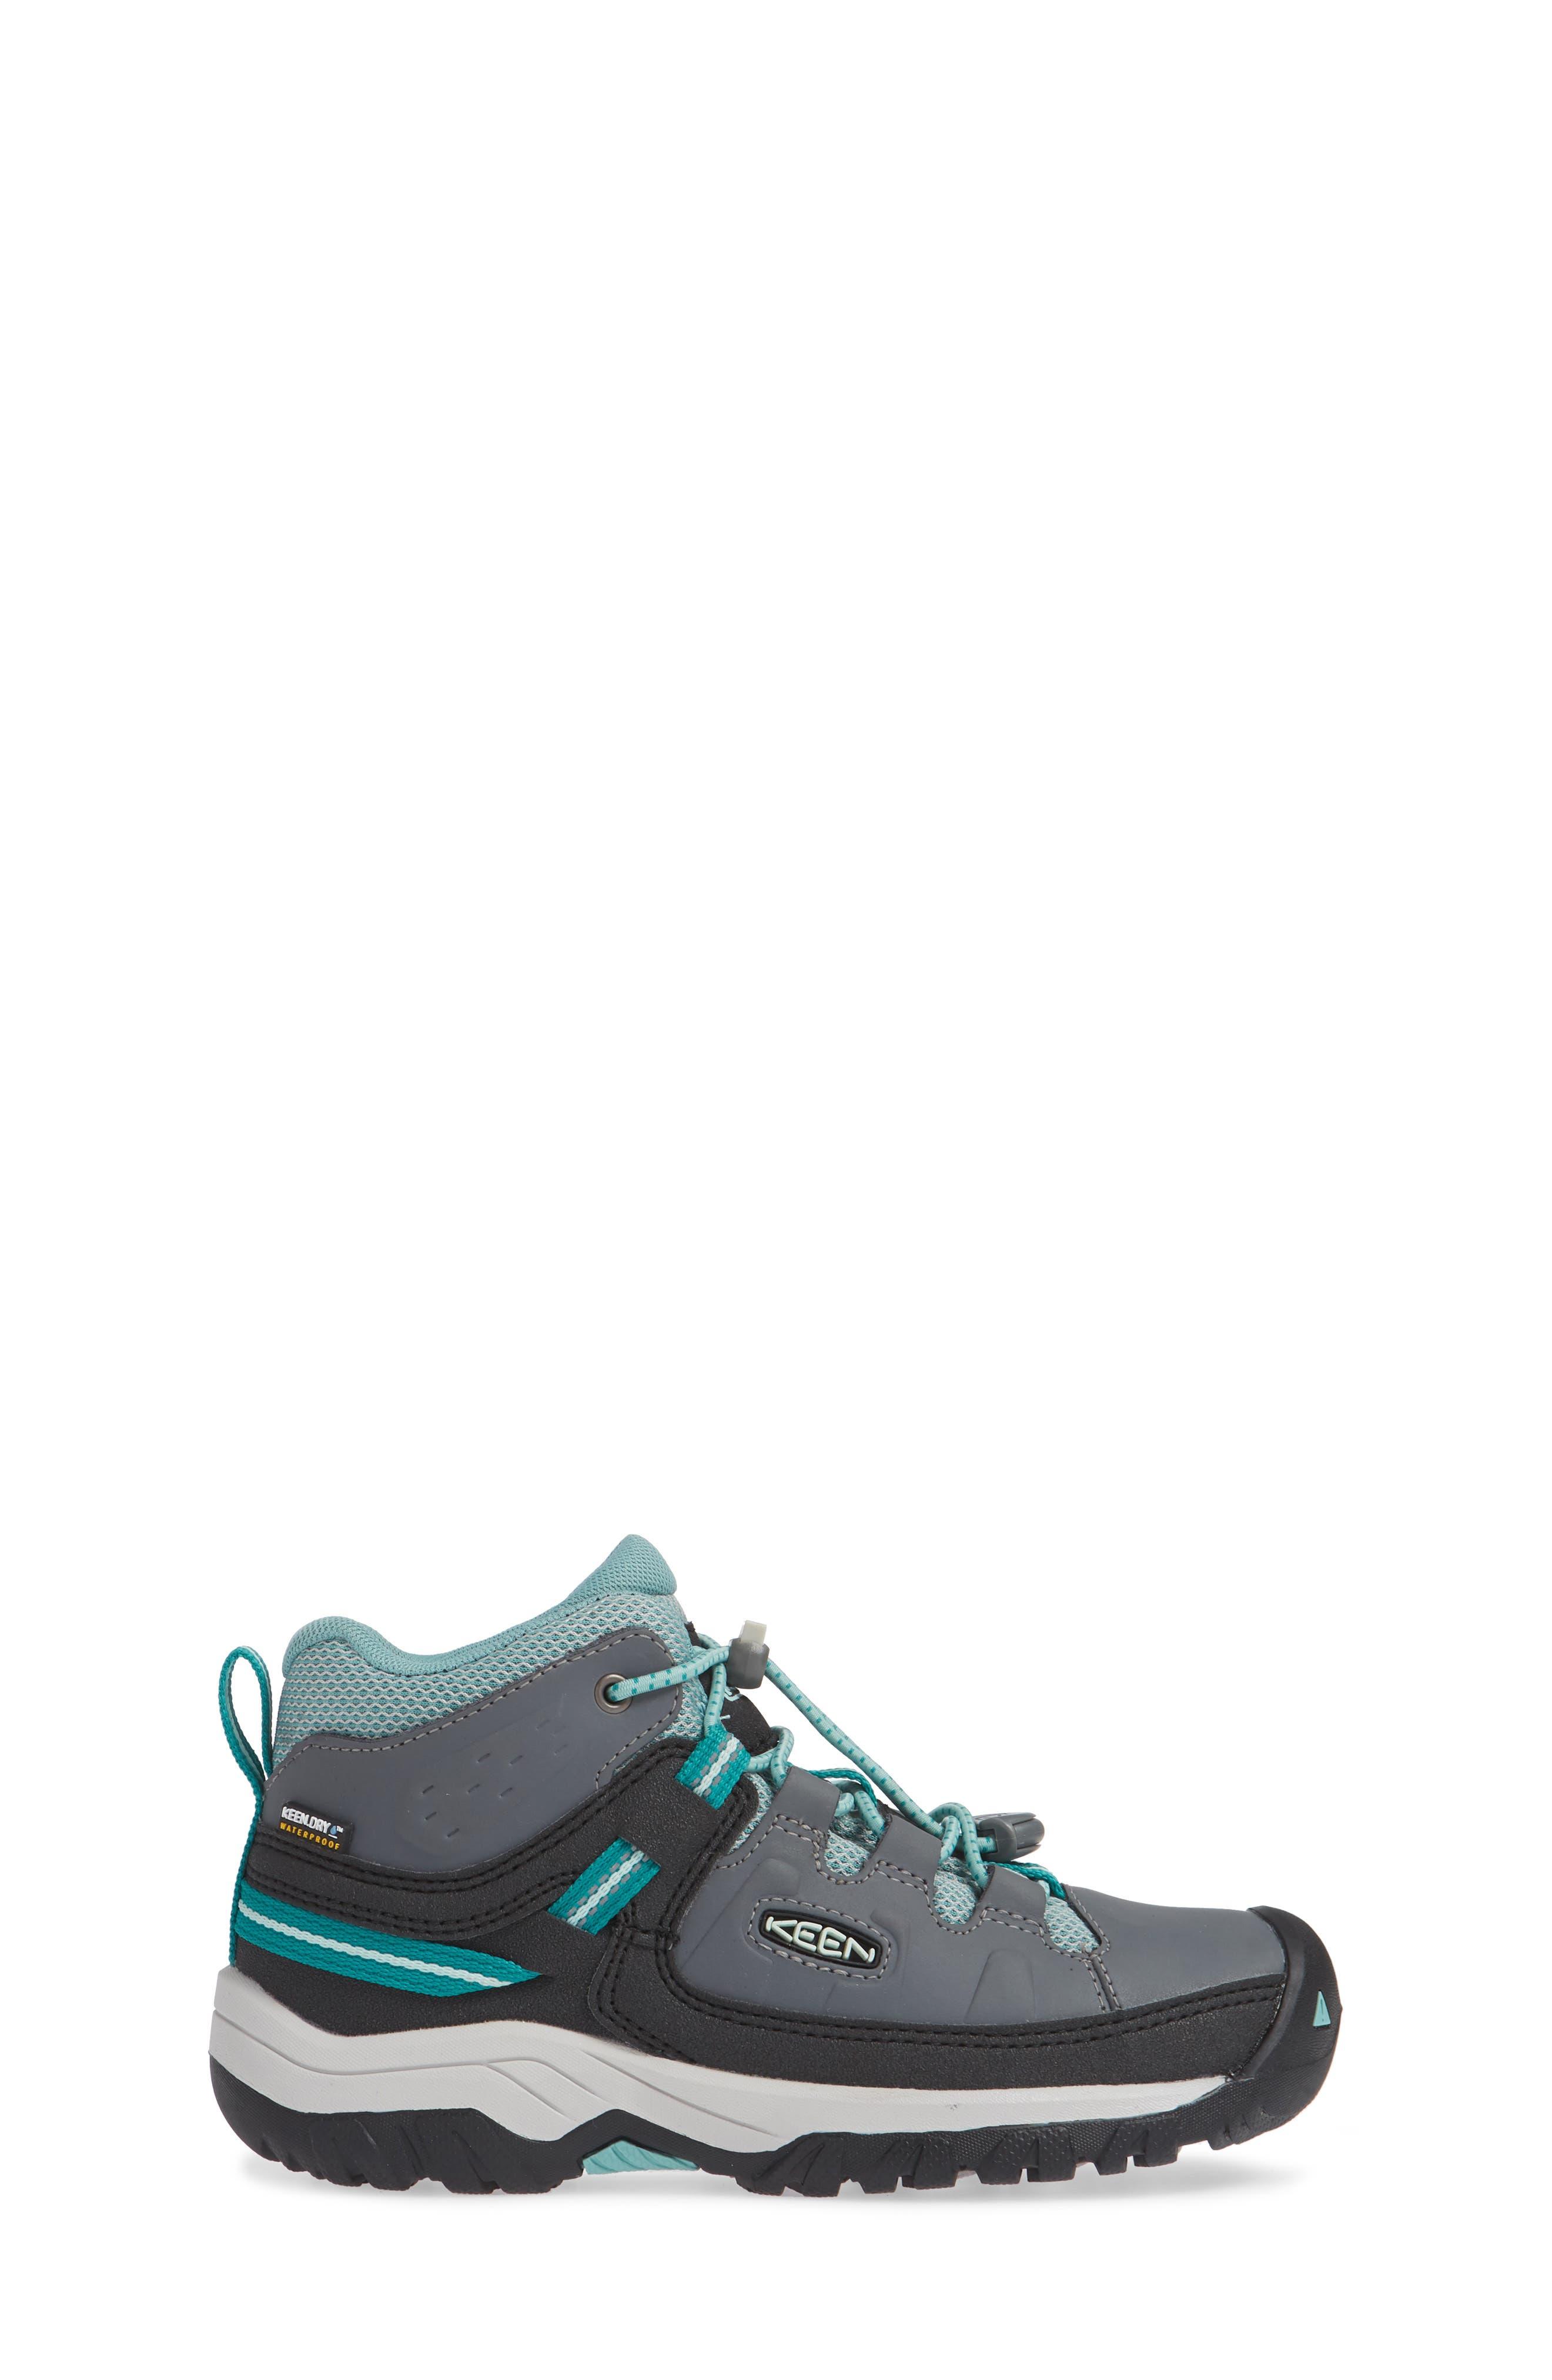 KEEN, Targhee Mid Waterproof Hiking Boot, Alternate thumbnail 3, color, GREY/ WASABI